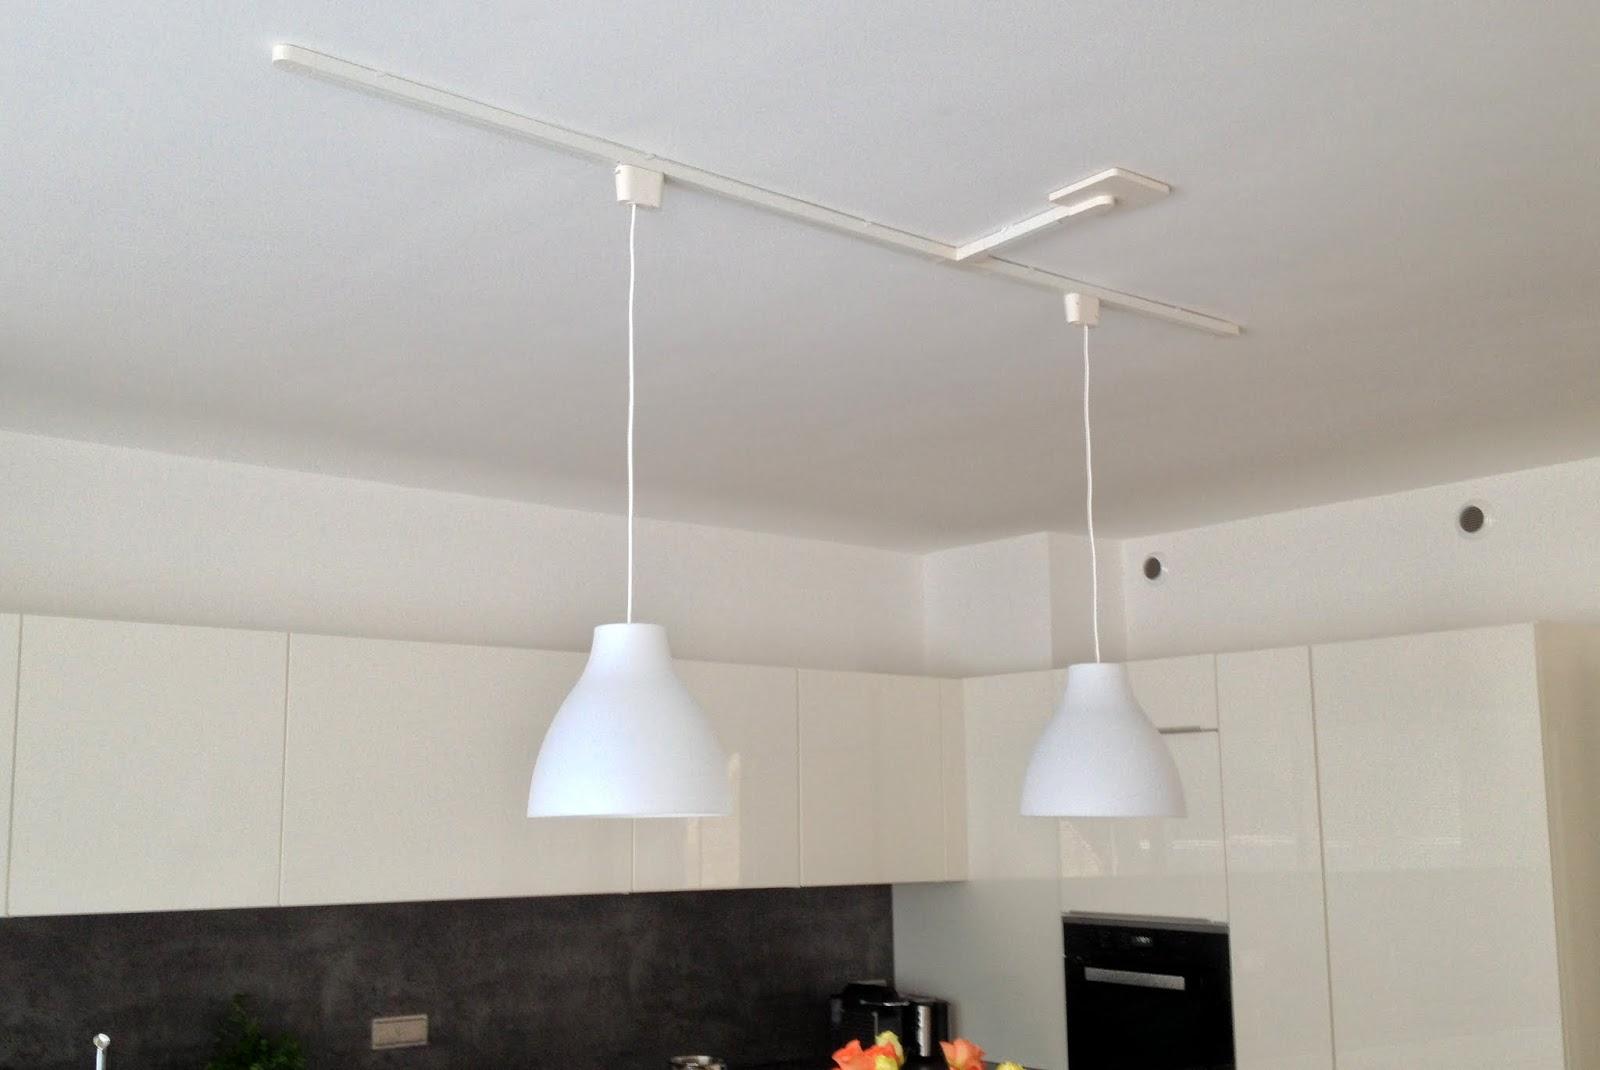 ikea 365 lichtleiste inkl lampen komplett 3 schienen kurven lampen top ebay. Black Bedroom Furniture Sets. Home Design Ideas